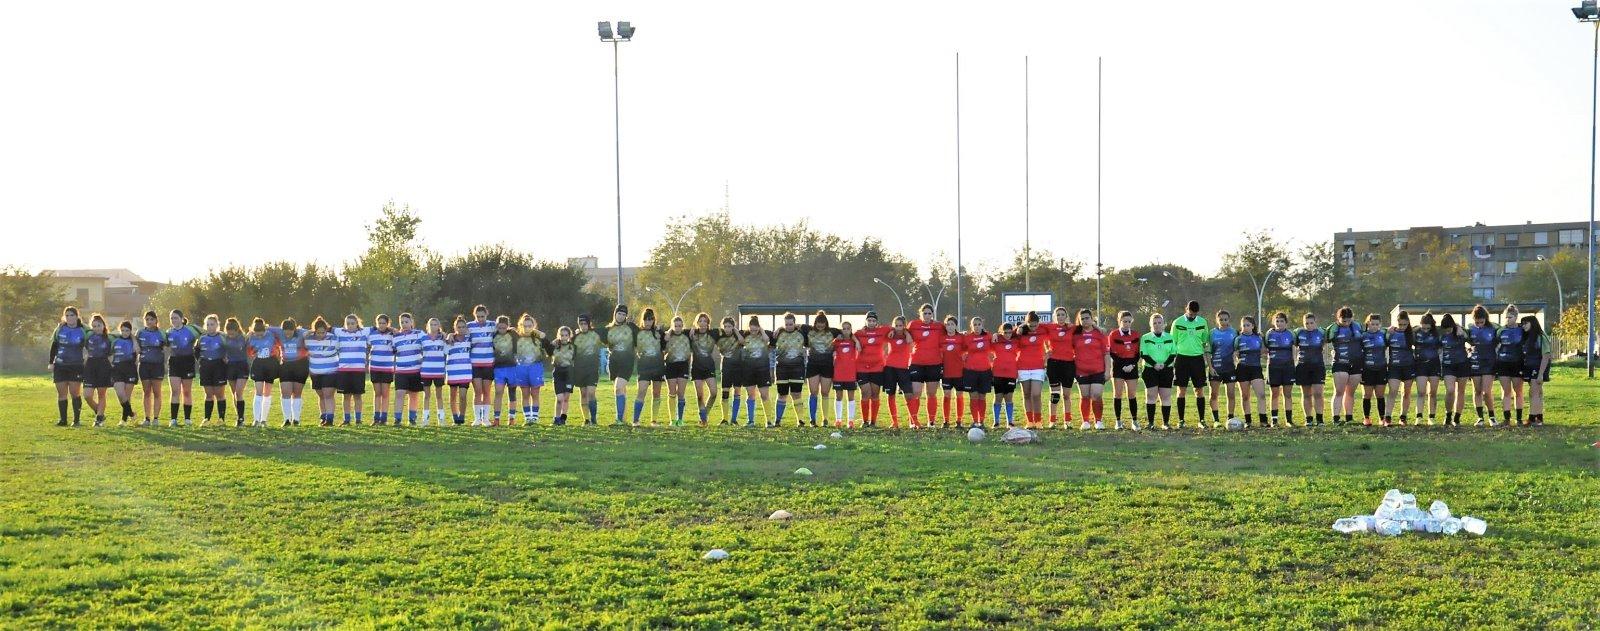 U16-U14 femminile: IV tappa Campionato Interregionale